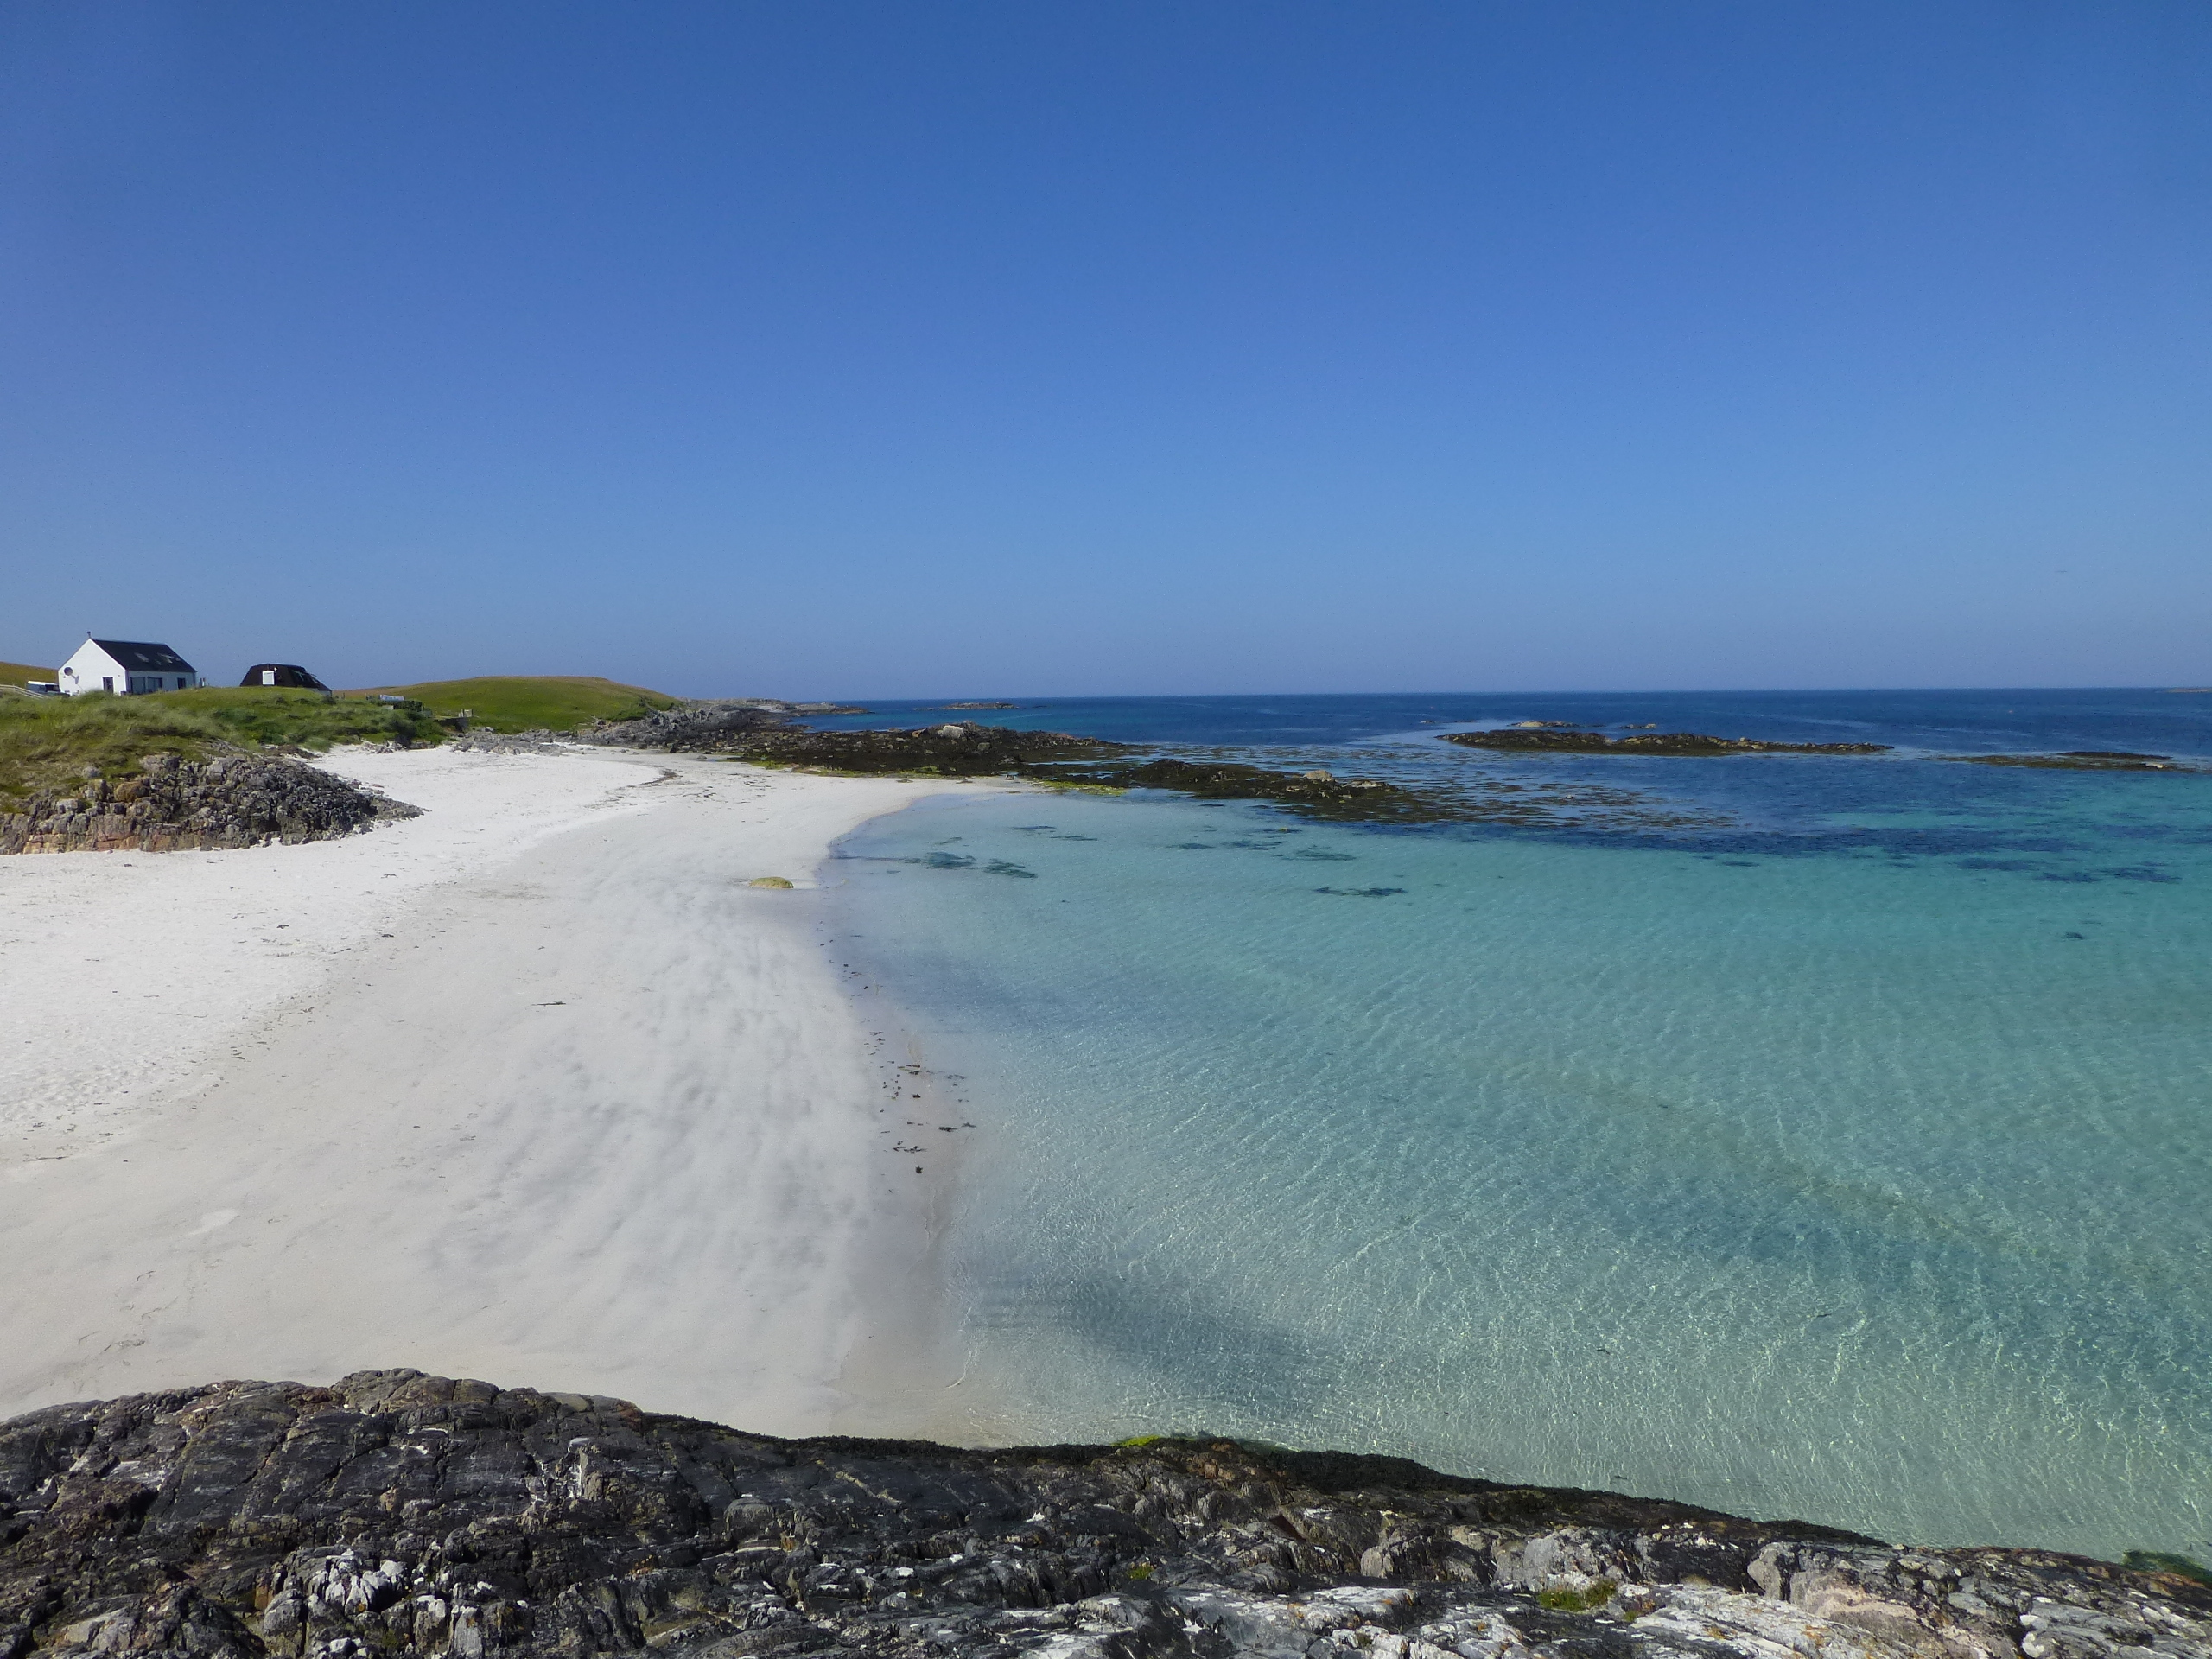 Caolas Beach on the Scottish island of Tiree